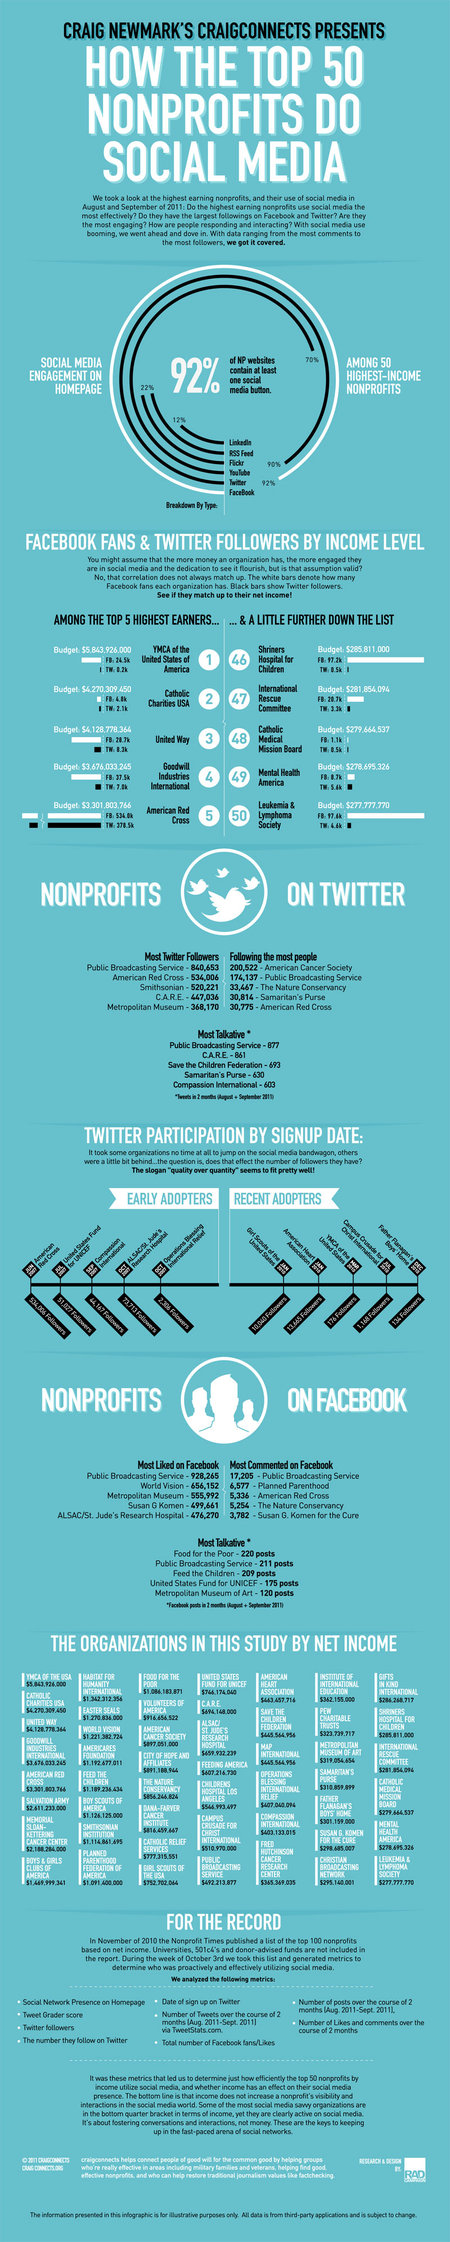 2011-10-14-infographic.jpg